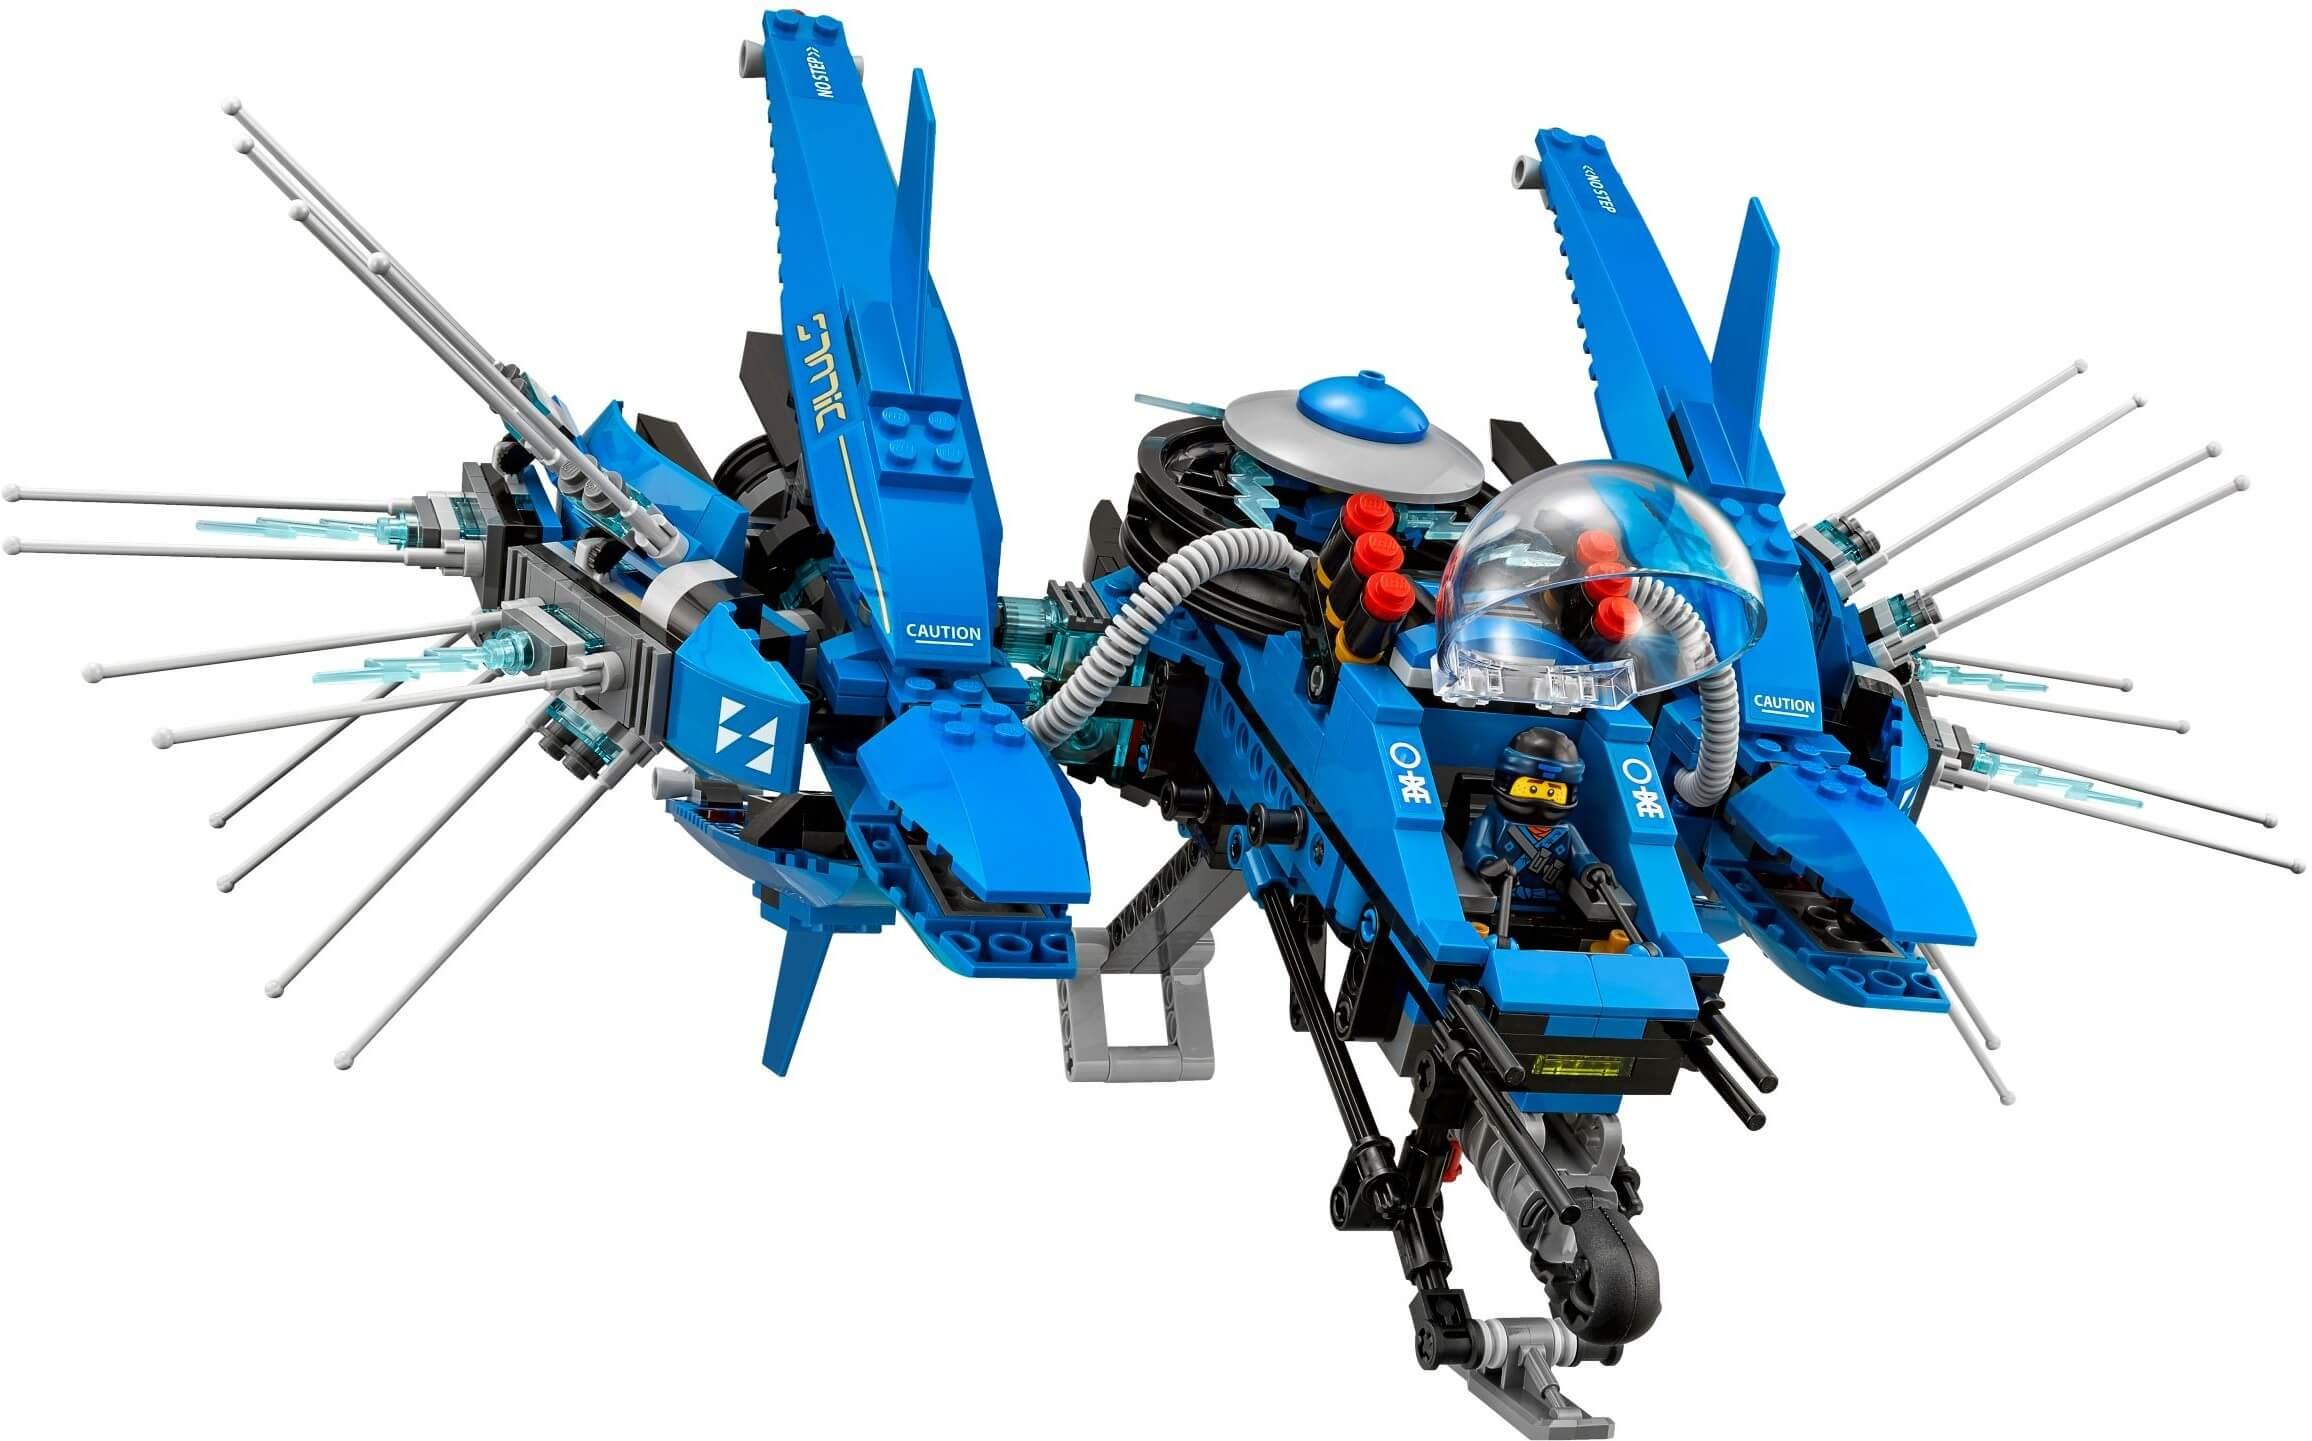 Mua đồ chơi LEGO 70614 - LEGO Ninjago 70614 - Máy Bay Tia Chớp của Jay (LEGO Ninjago Lightning Jet)